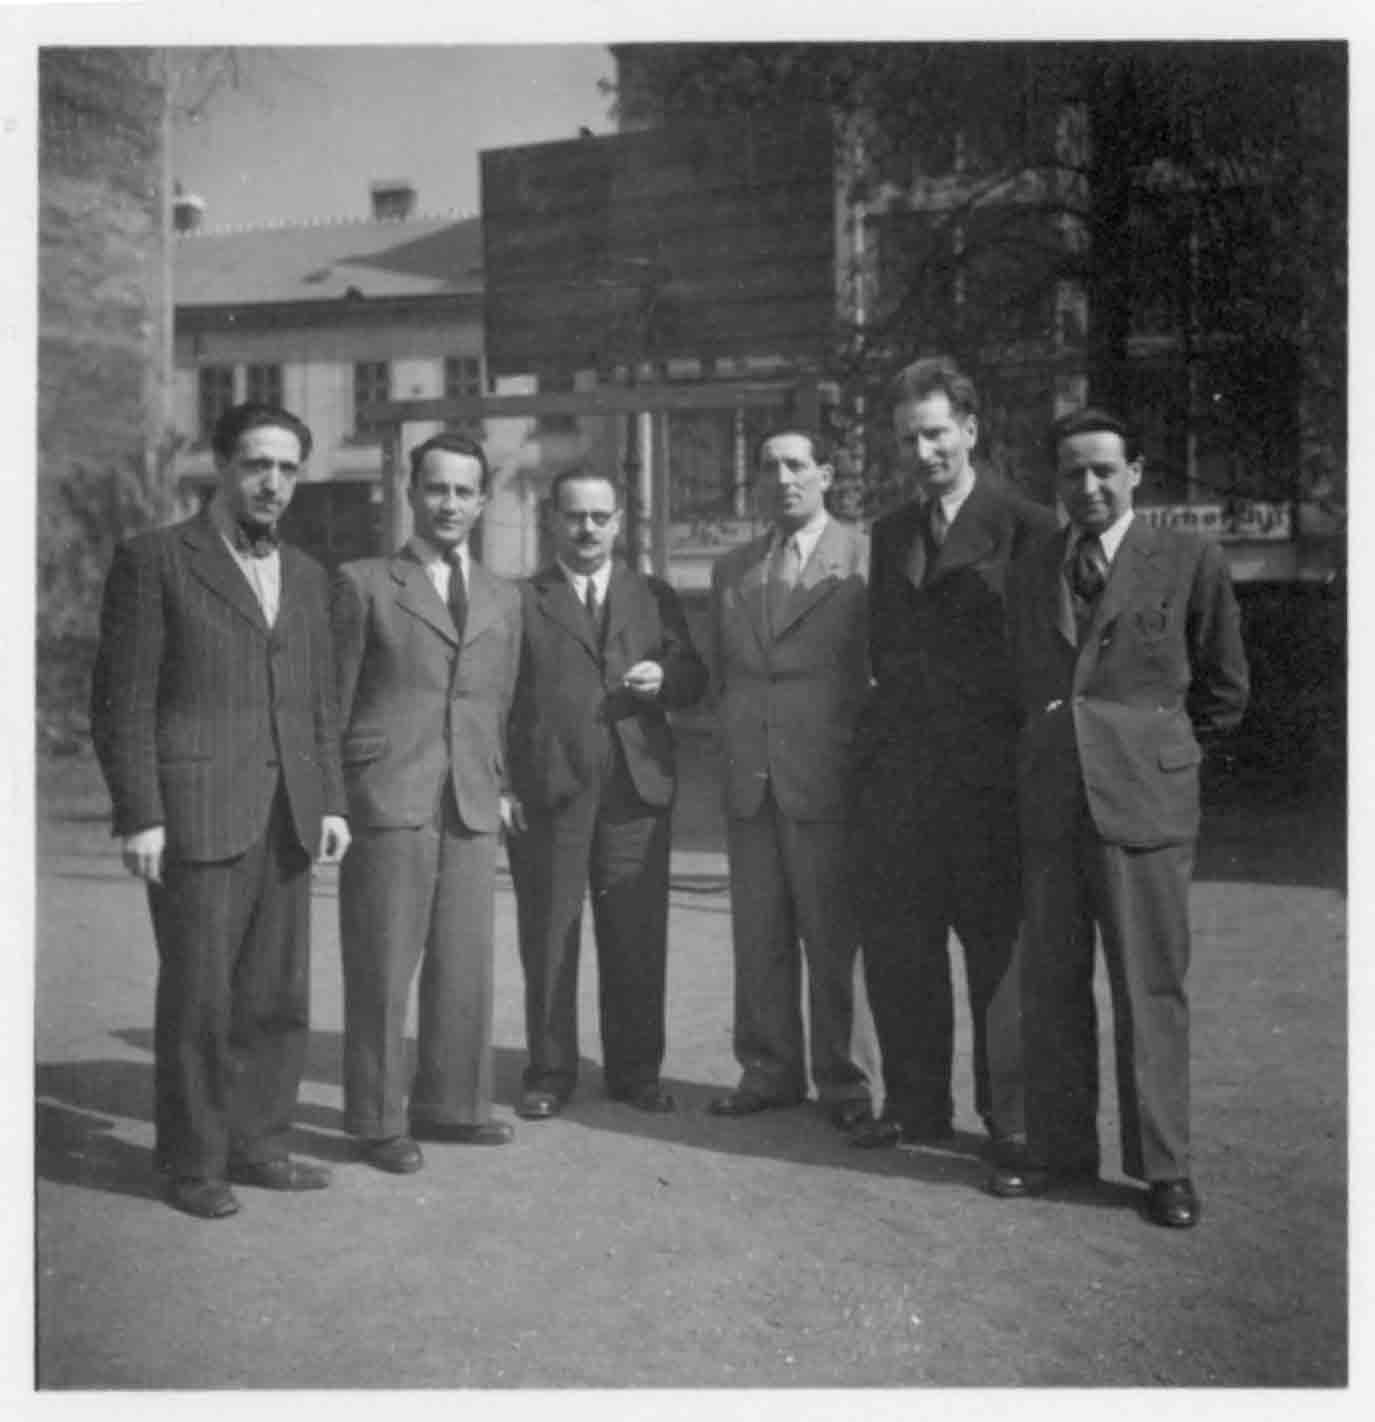 Zleva: Pavel Haas, Valtr Eisinger, Eduard Drachmann, Engelstein, Erich Blau, tajemník